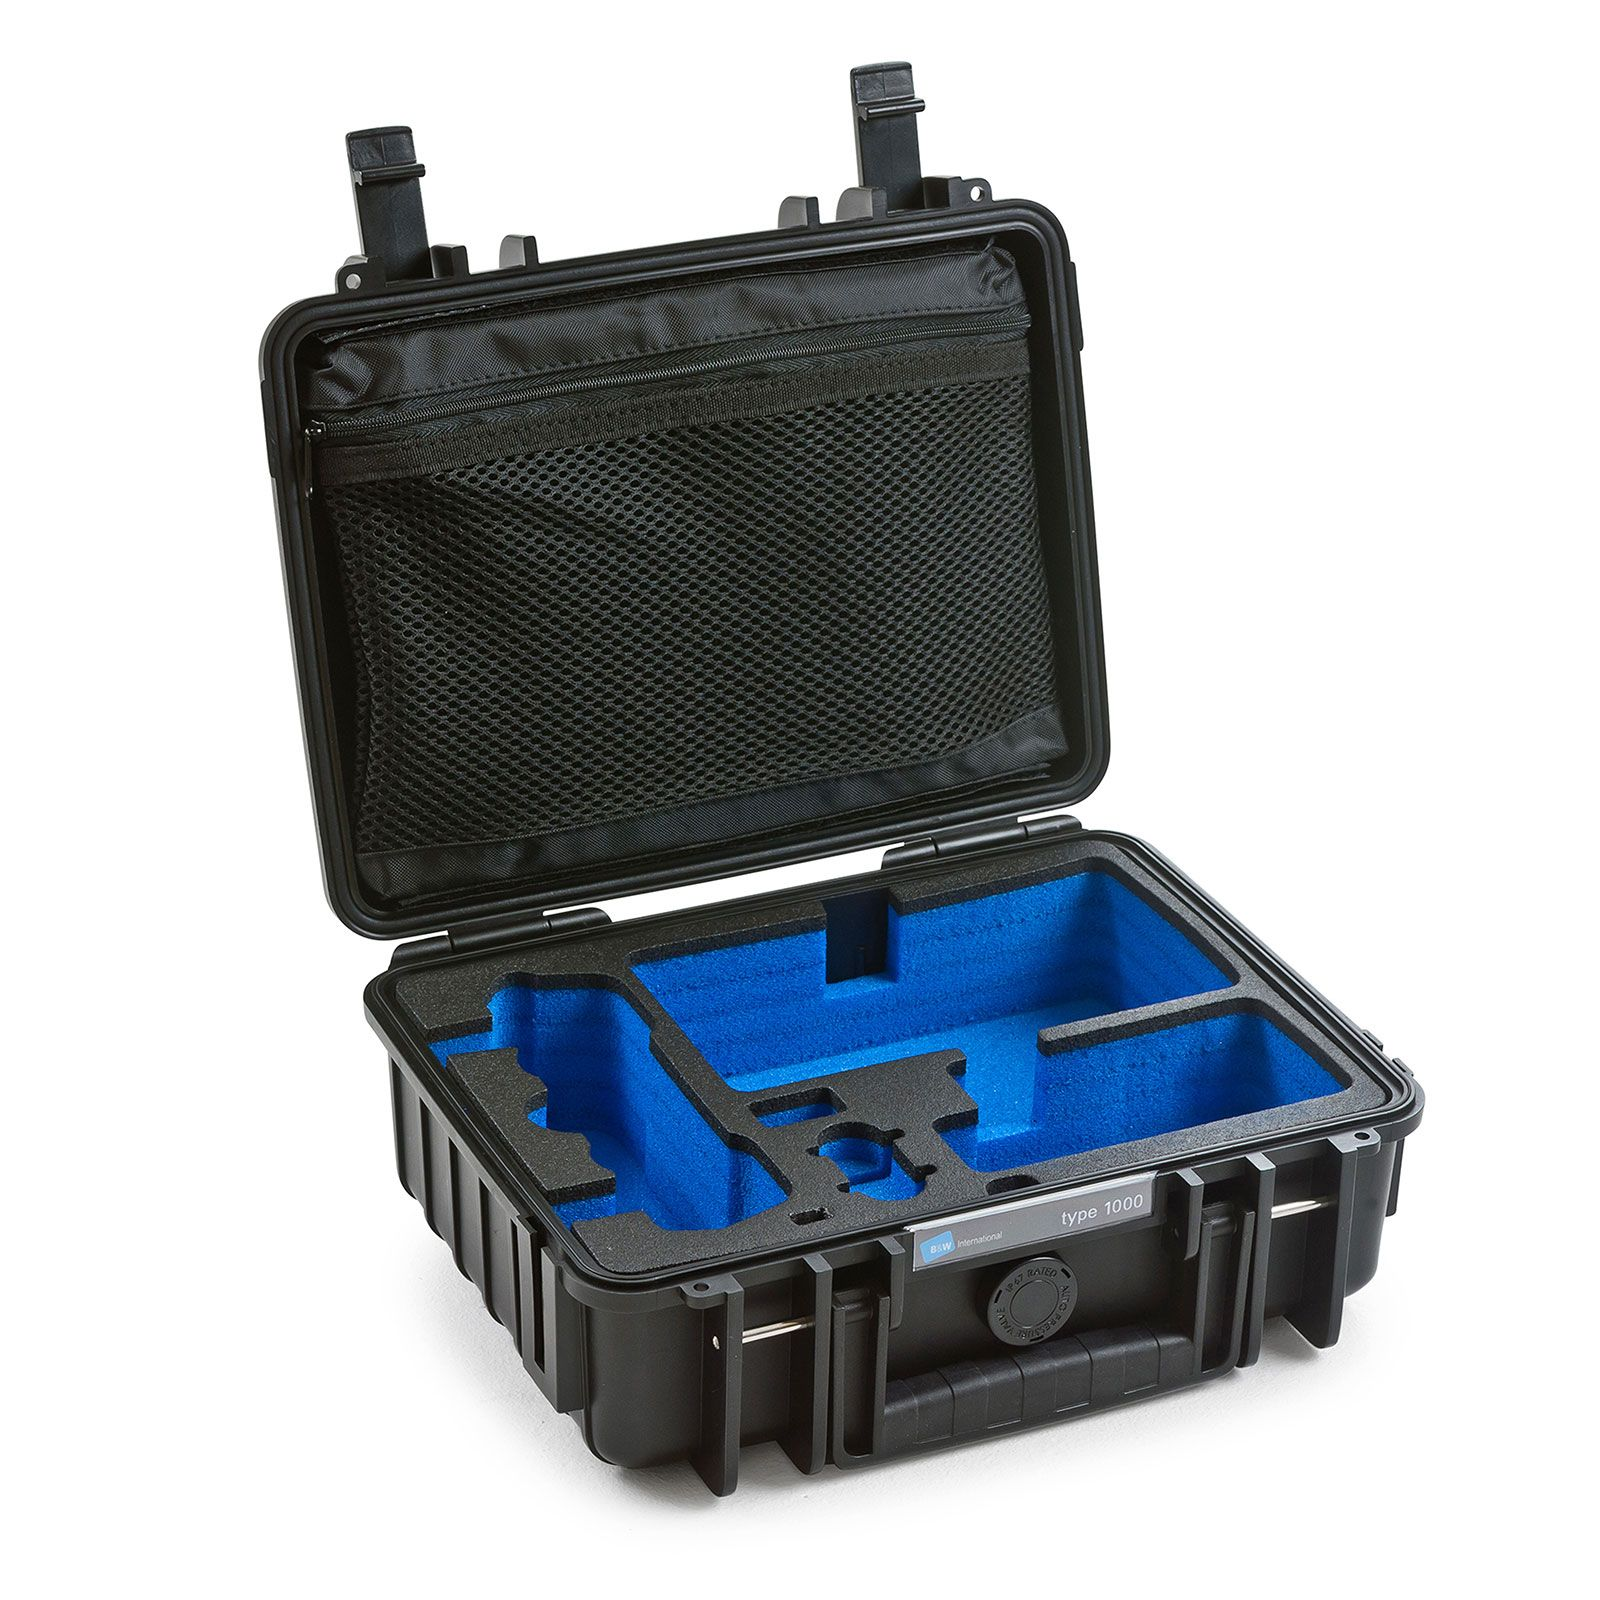 B&W Copter Case Typ 1000 für DJI Mavic Air grau mit